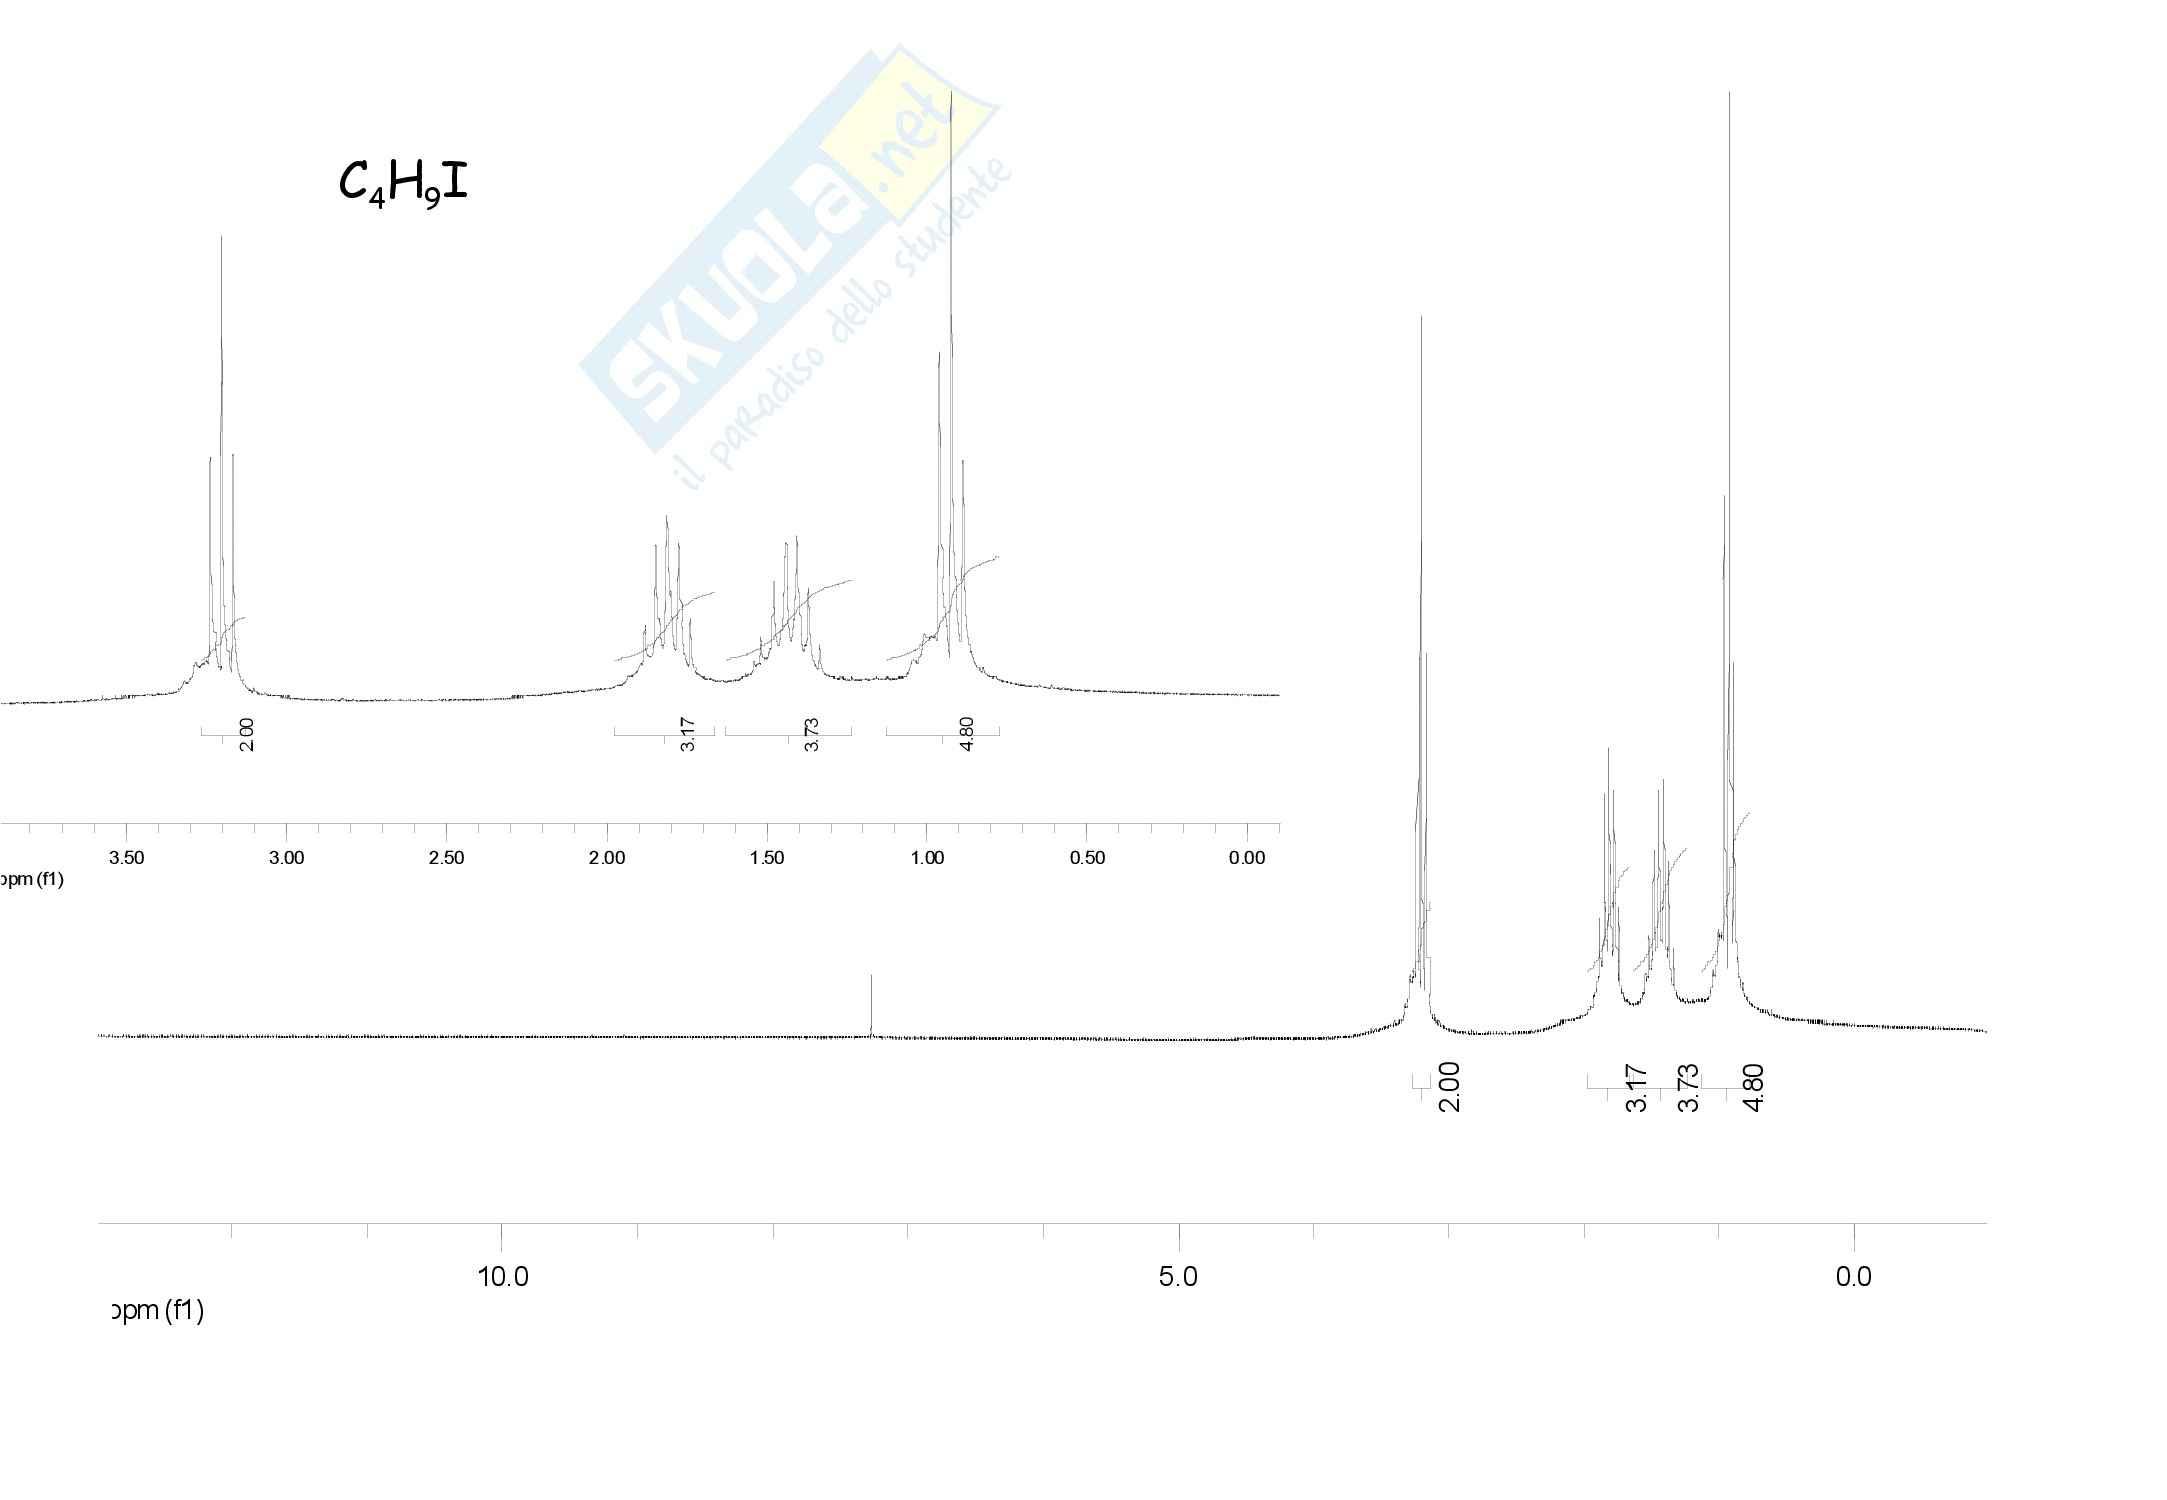 Chimica organica - spettri NMR incogniti